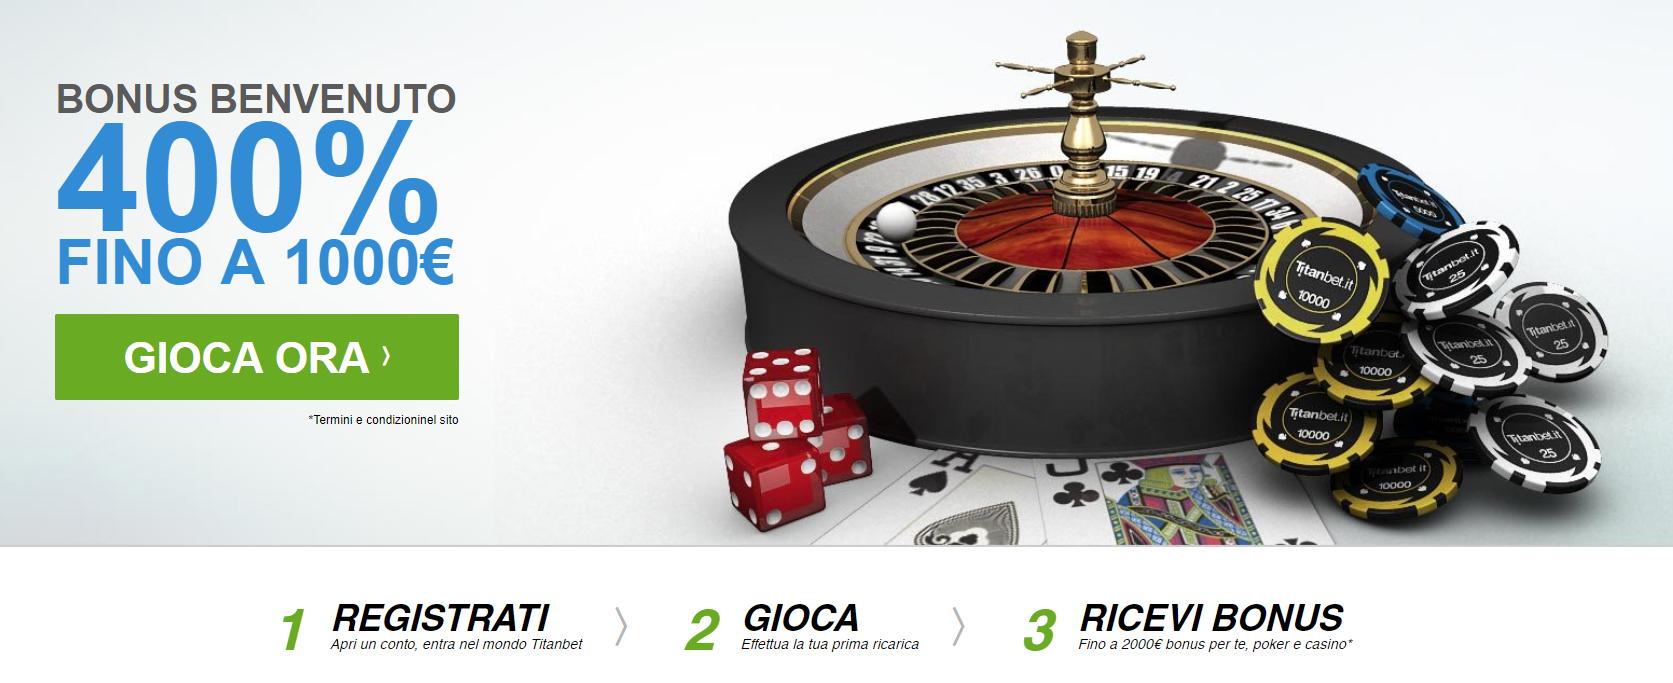 Betfair casino blackjack